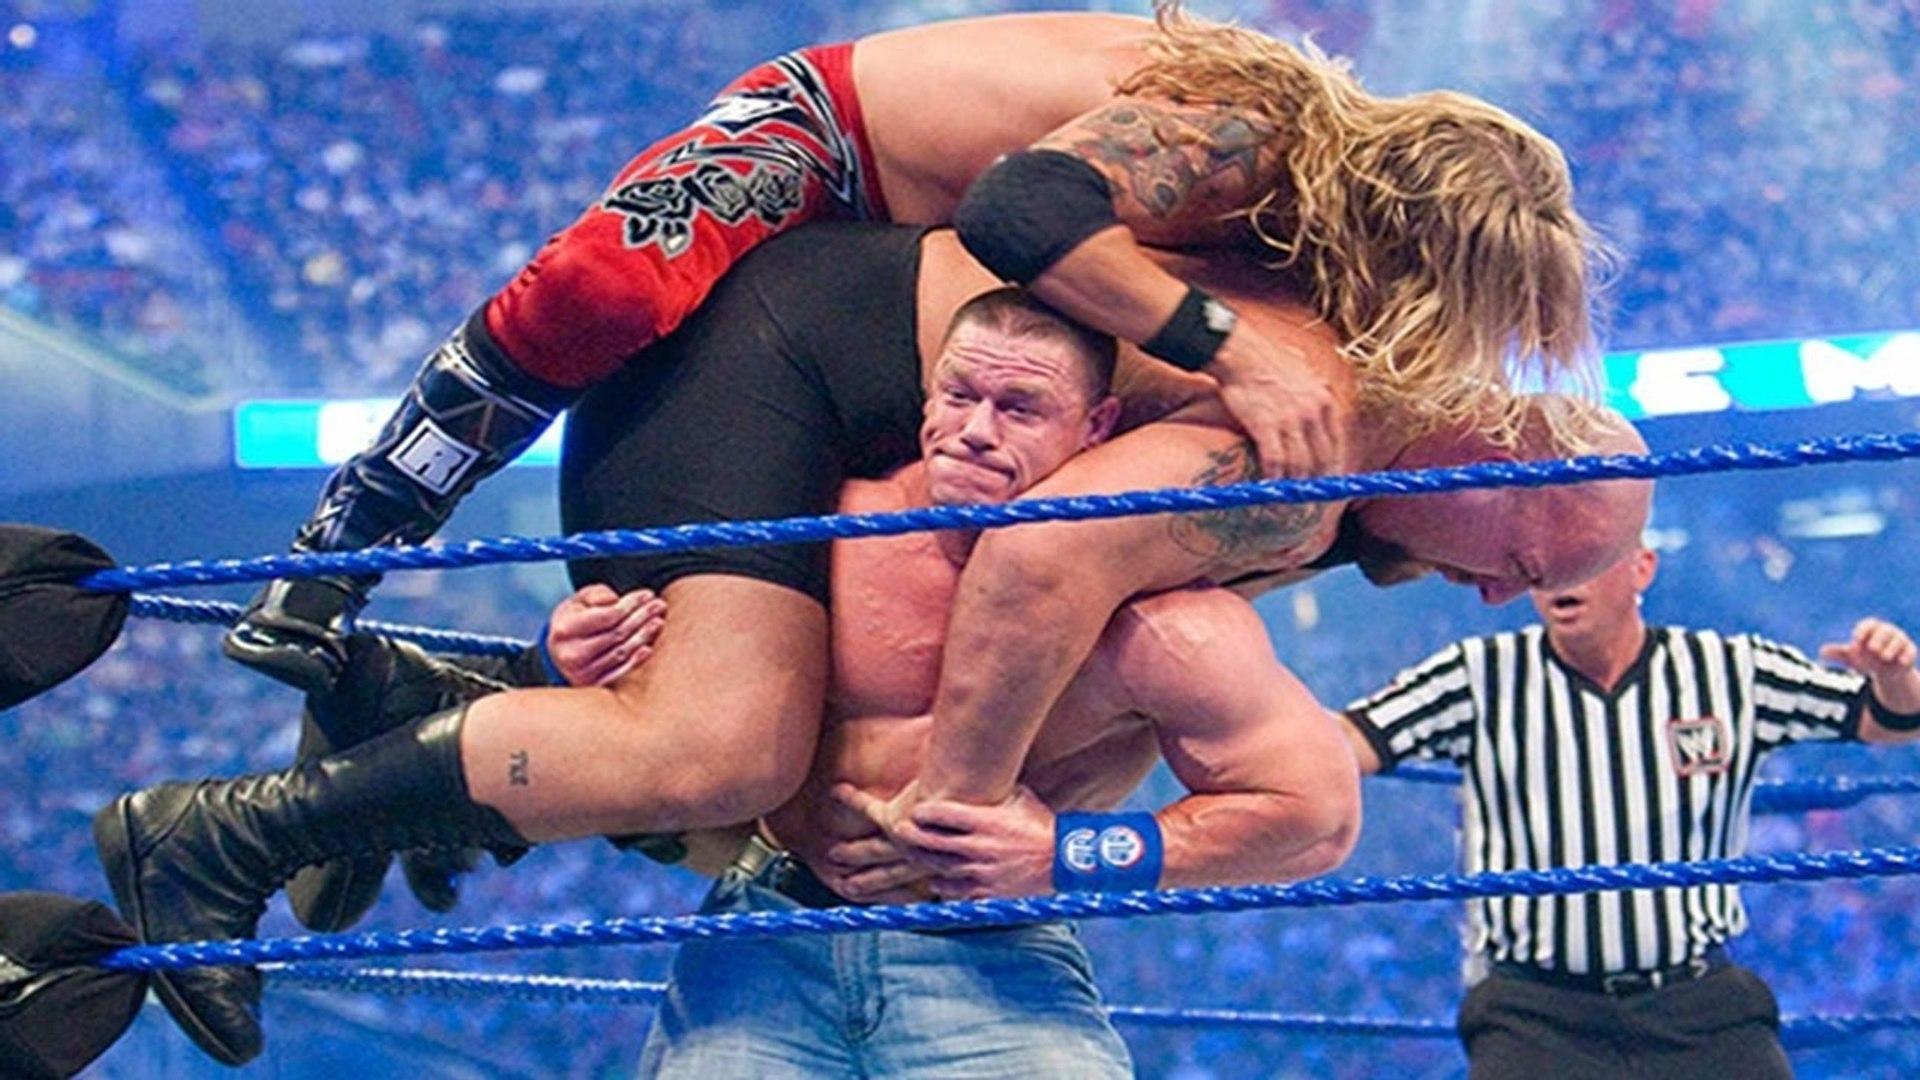 John Cena Vs Edge Vs Big Show - Wrestlemania 25 - Dailymotion Full Match - WWE - video Dailymotion